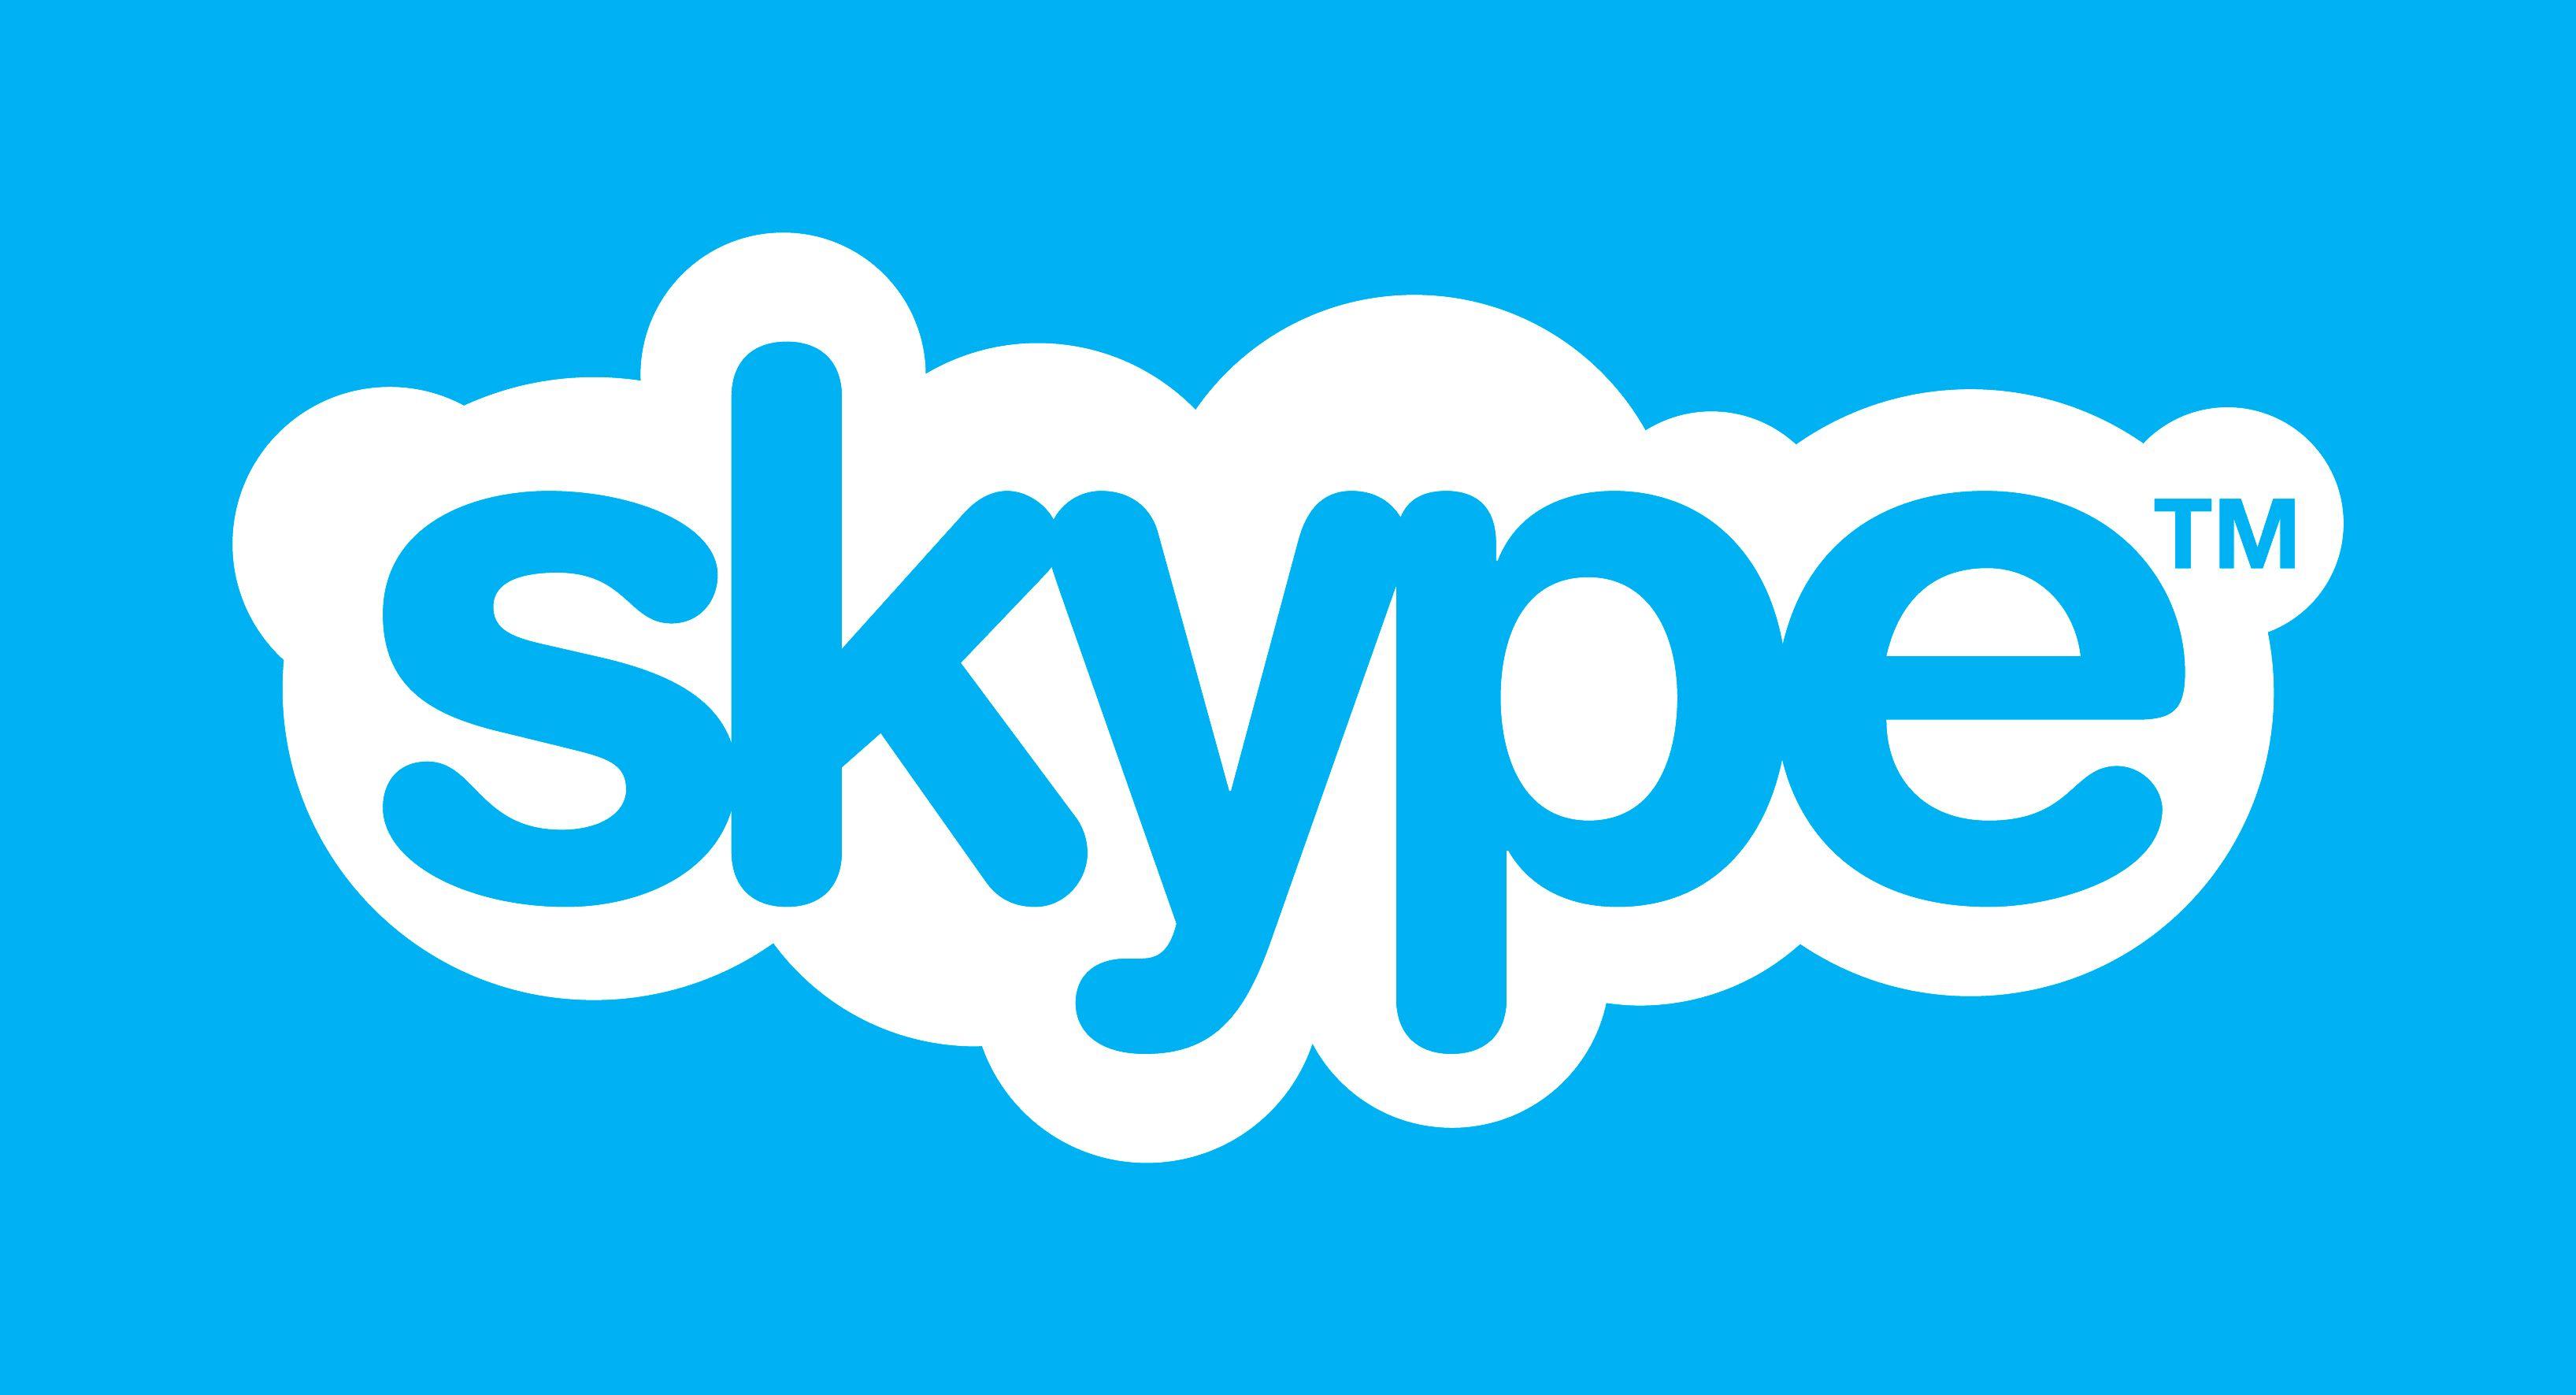 Chantal Skype